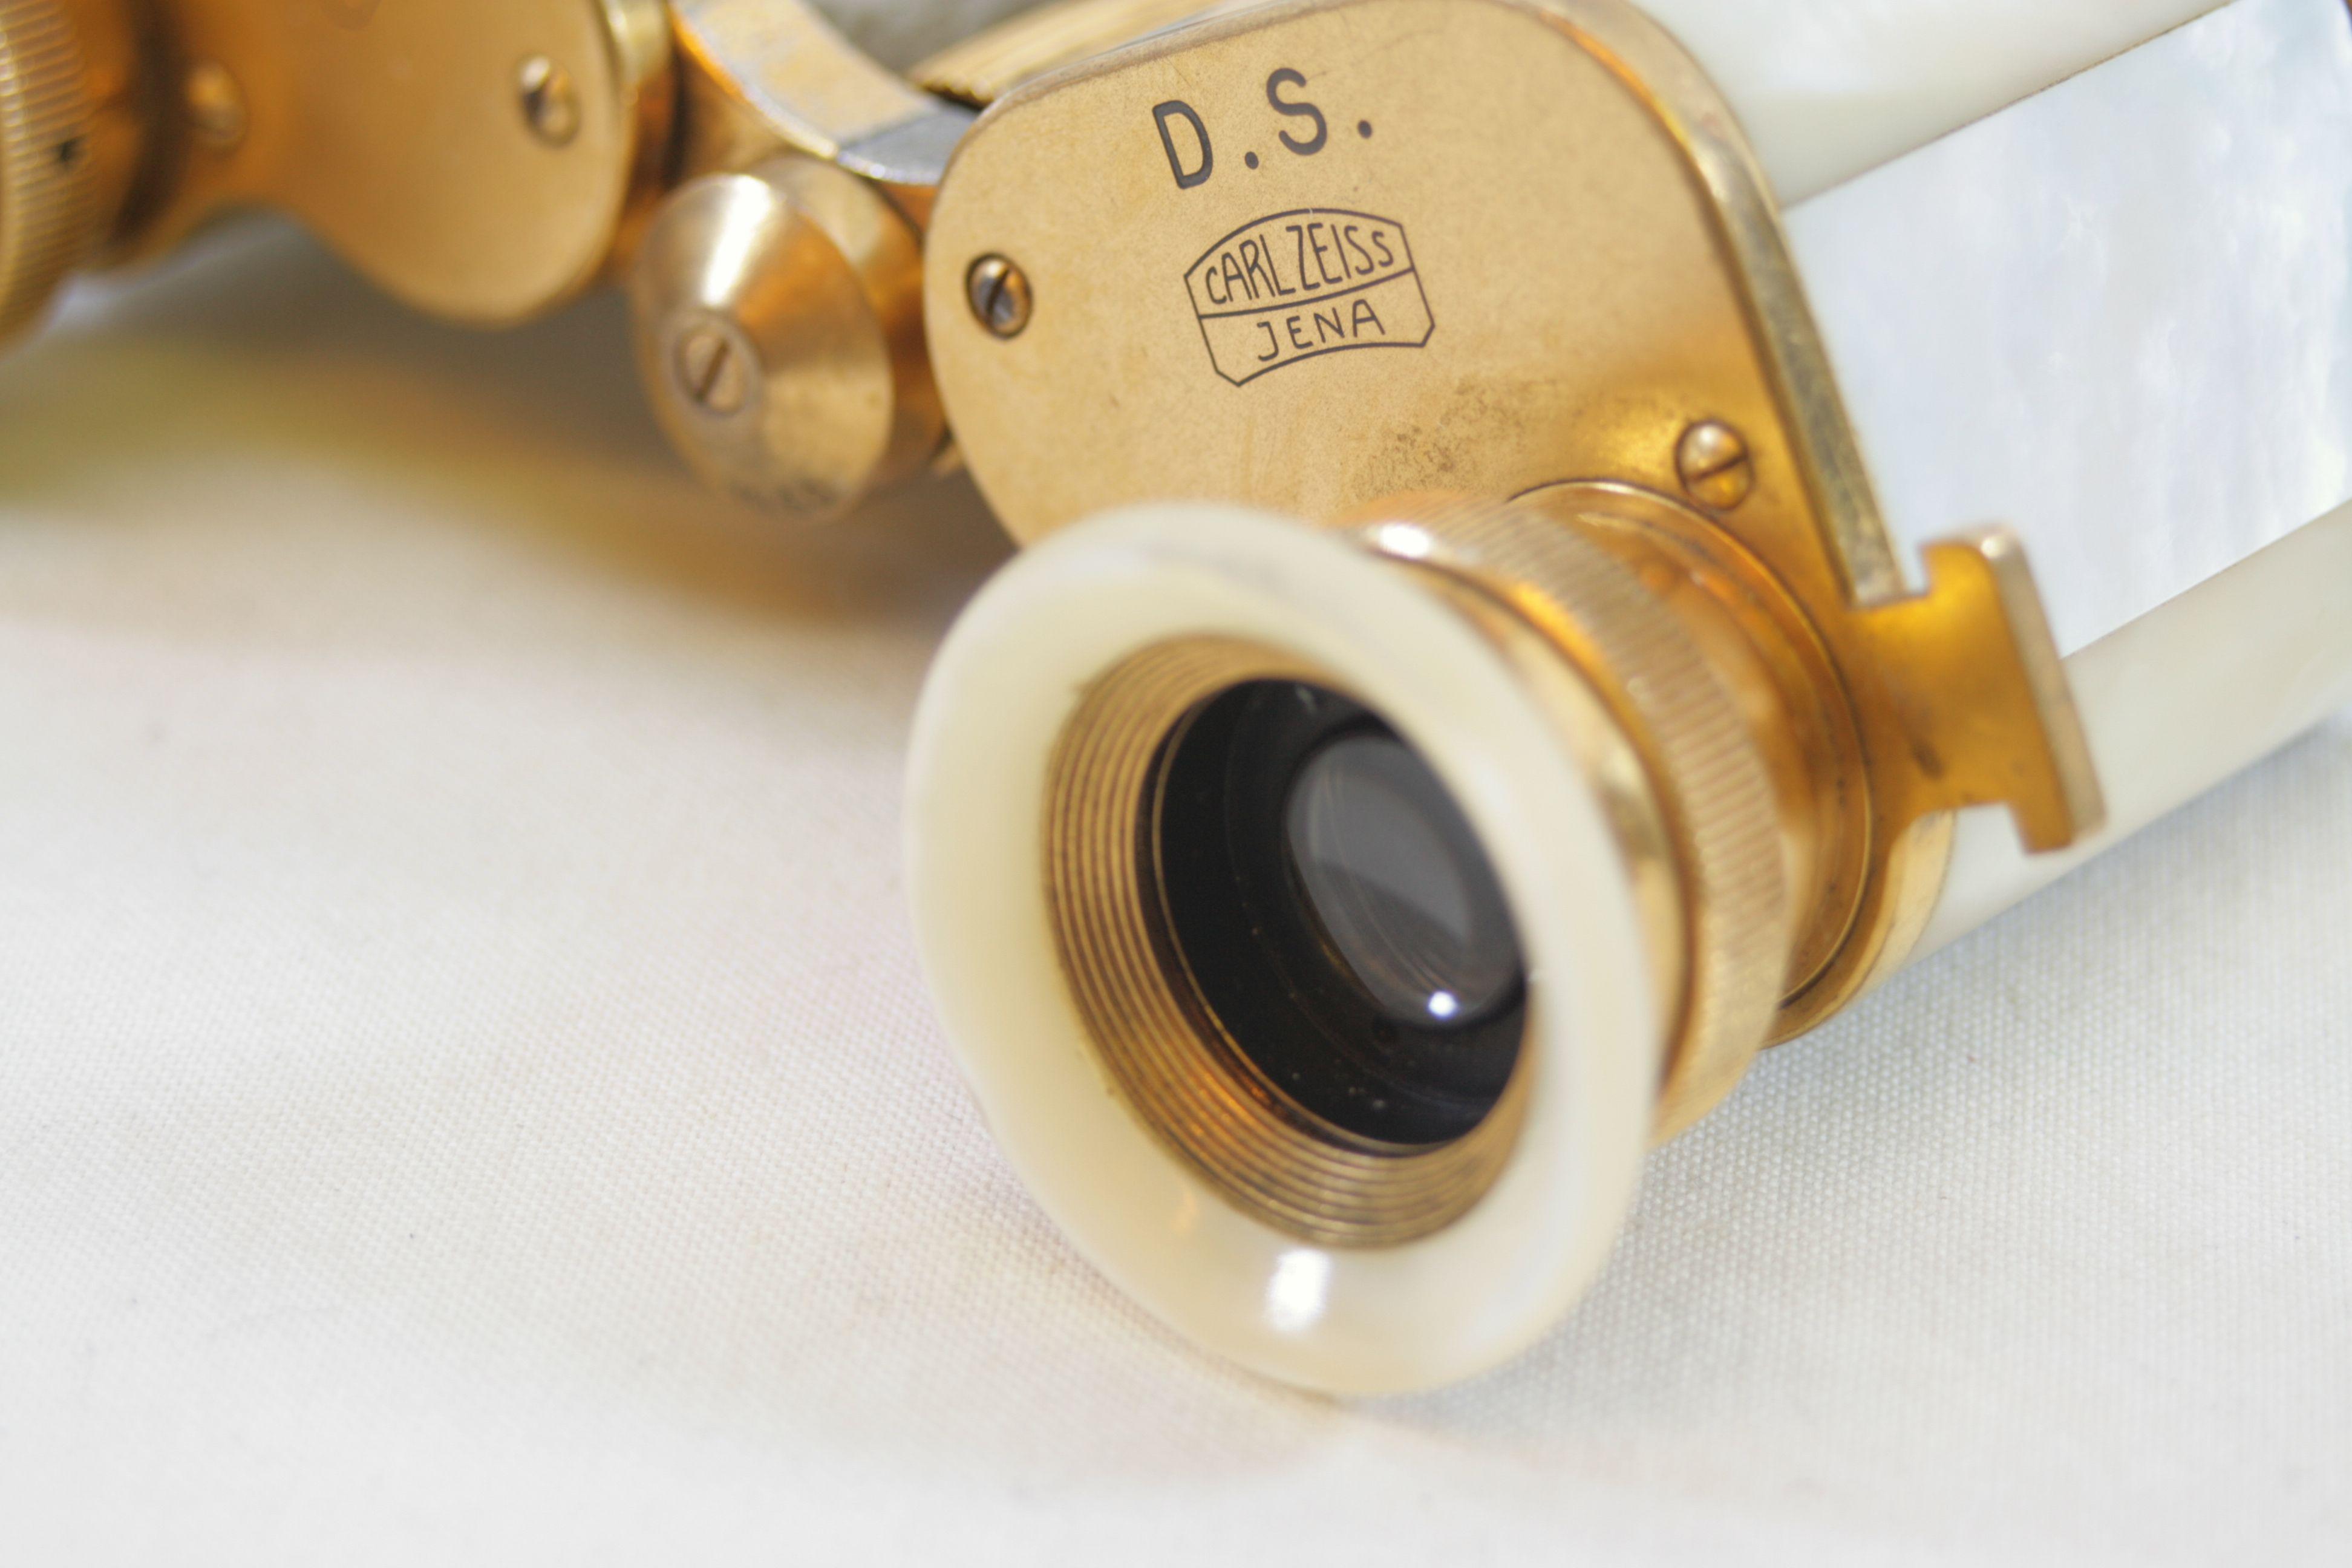 57b2f65a387 Open Full-Size Image. Carl Zeiss Jena Teleater 3 x 13.5 Prismatic Pearl  Opera Glasses   Binoculars 9